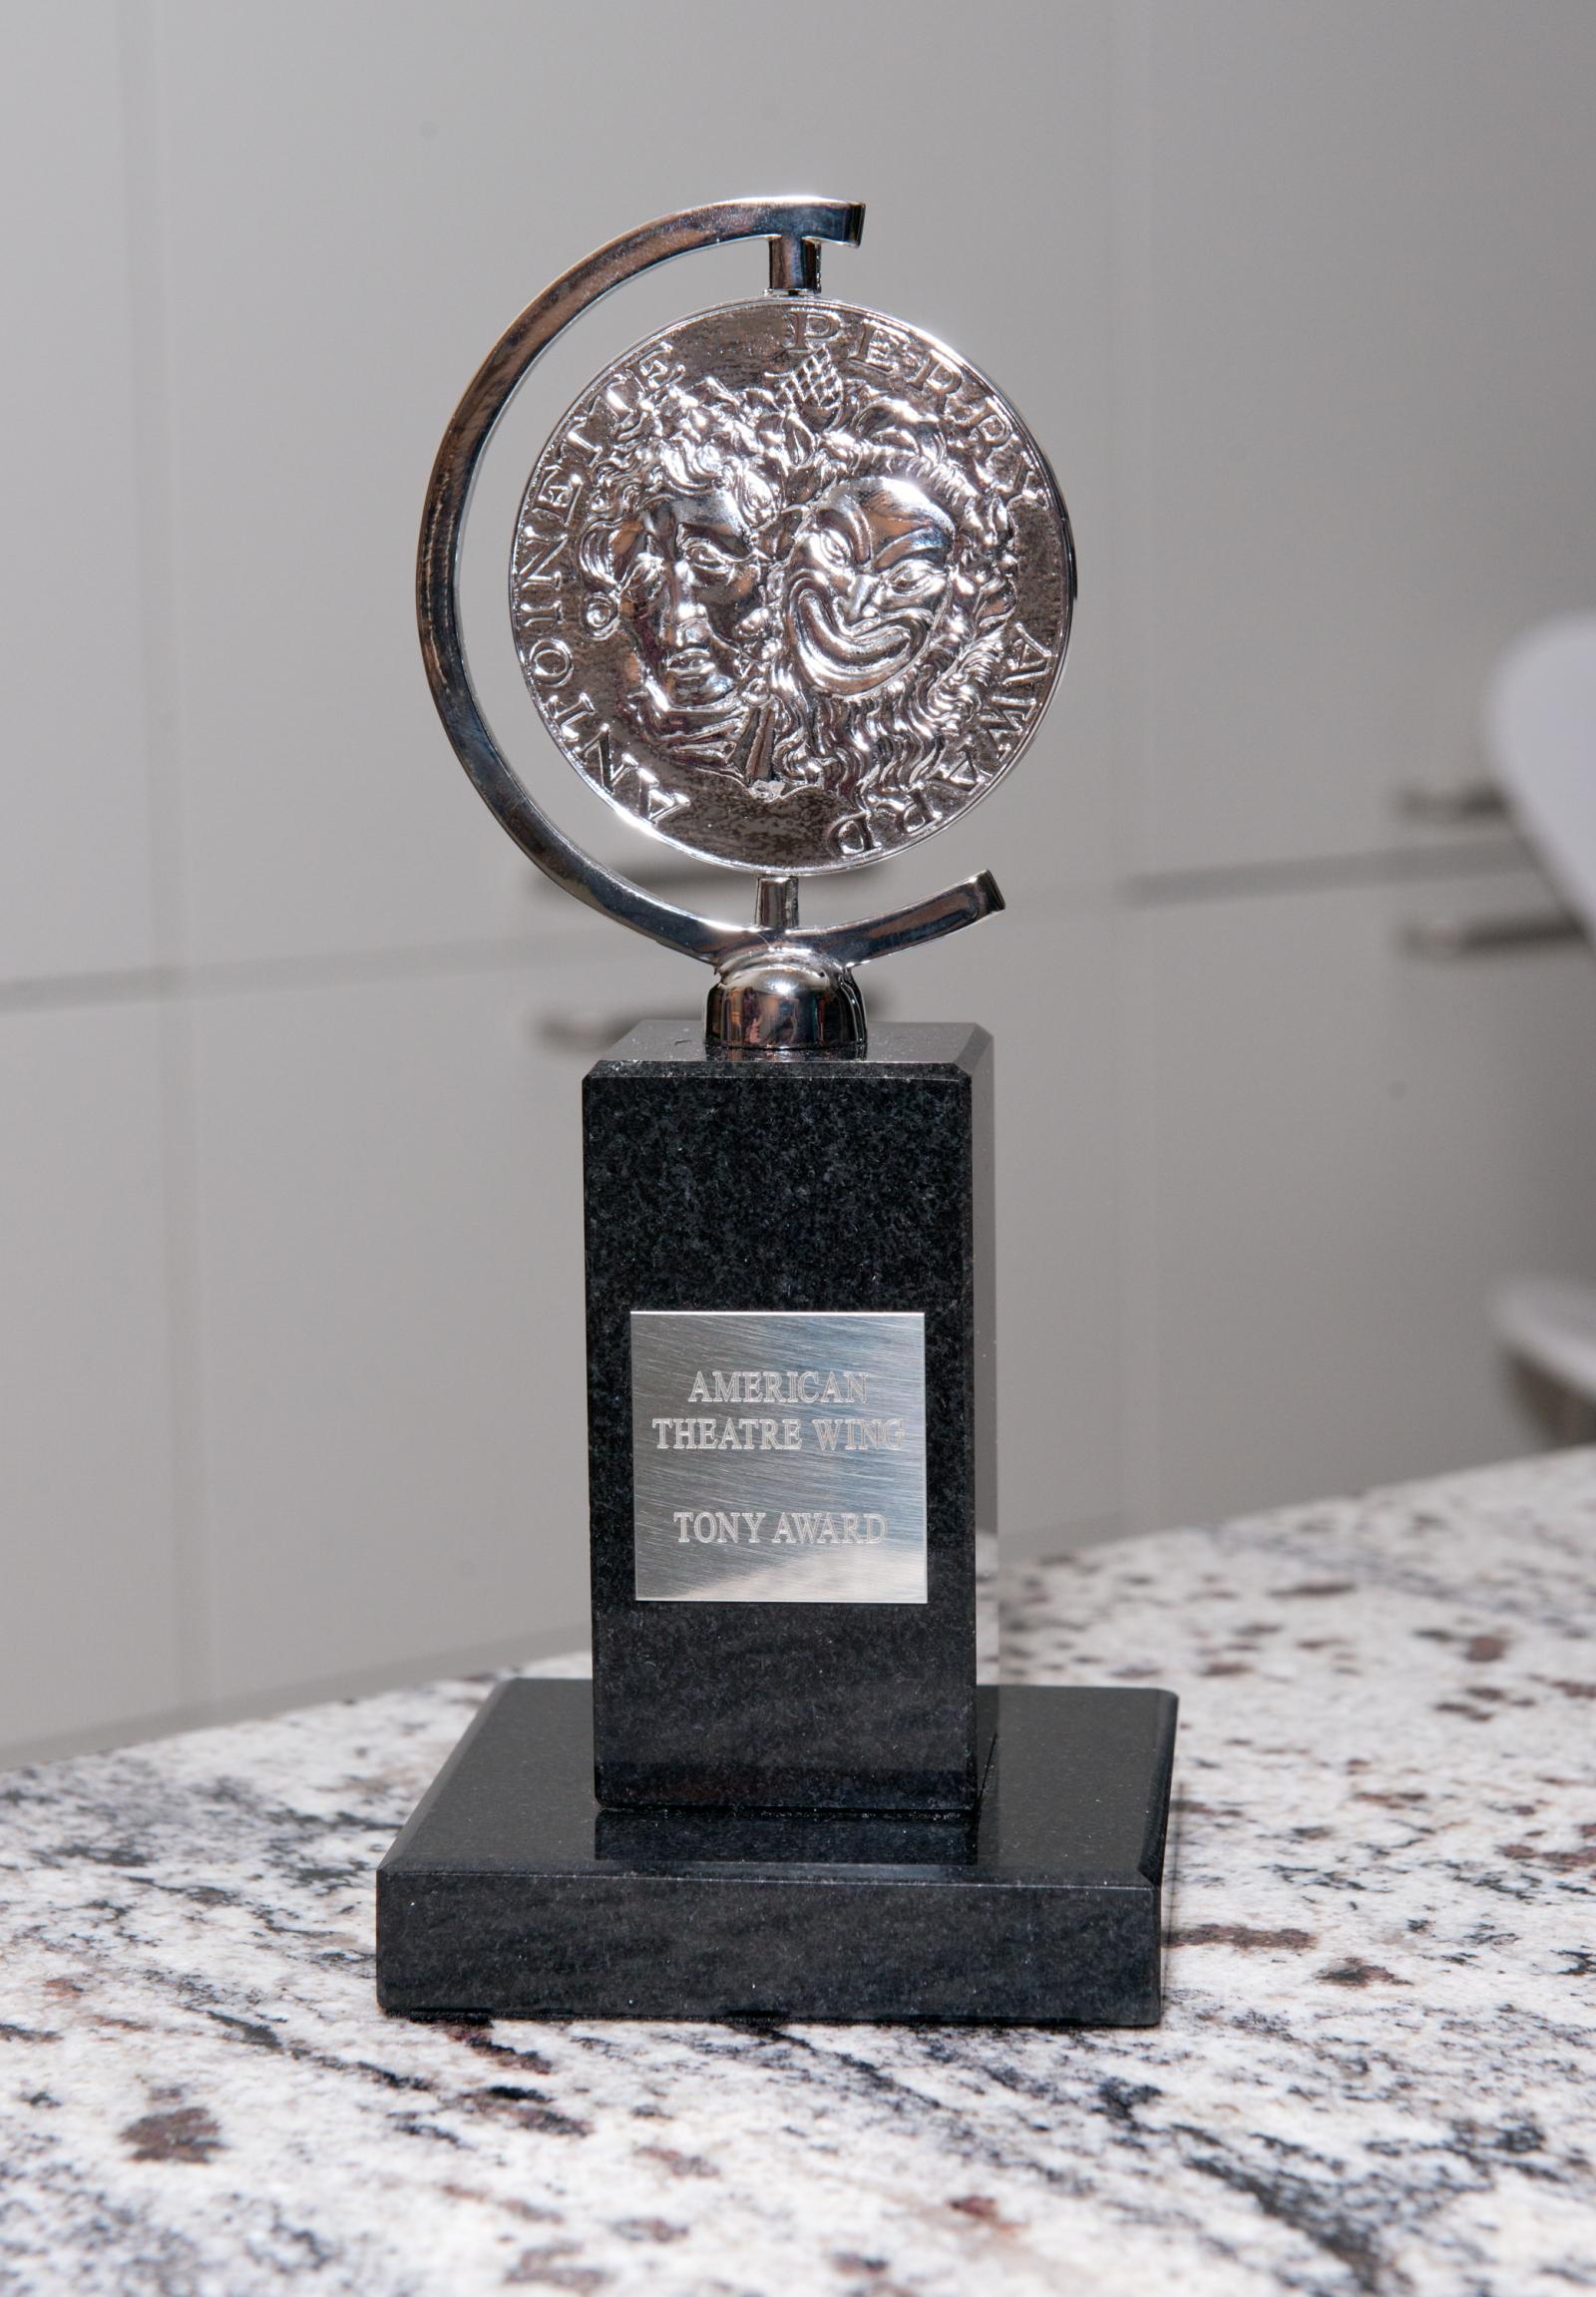 Tony Awards 2015 Live Stream Where To Watch Online